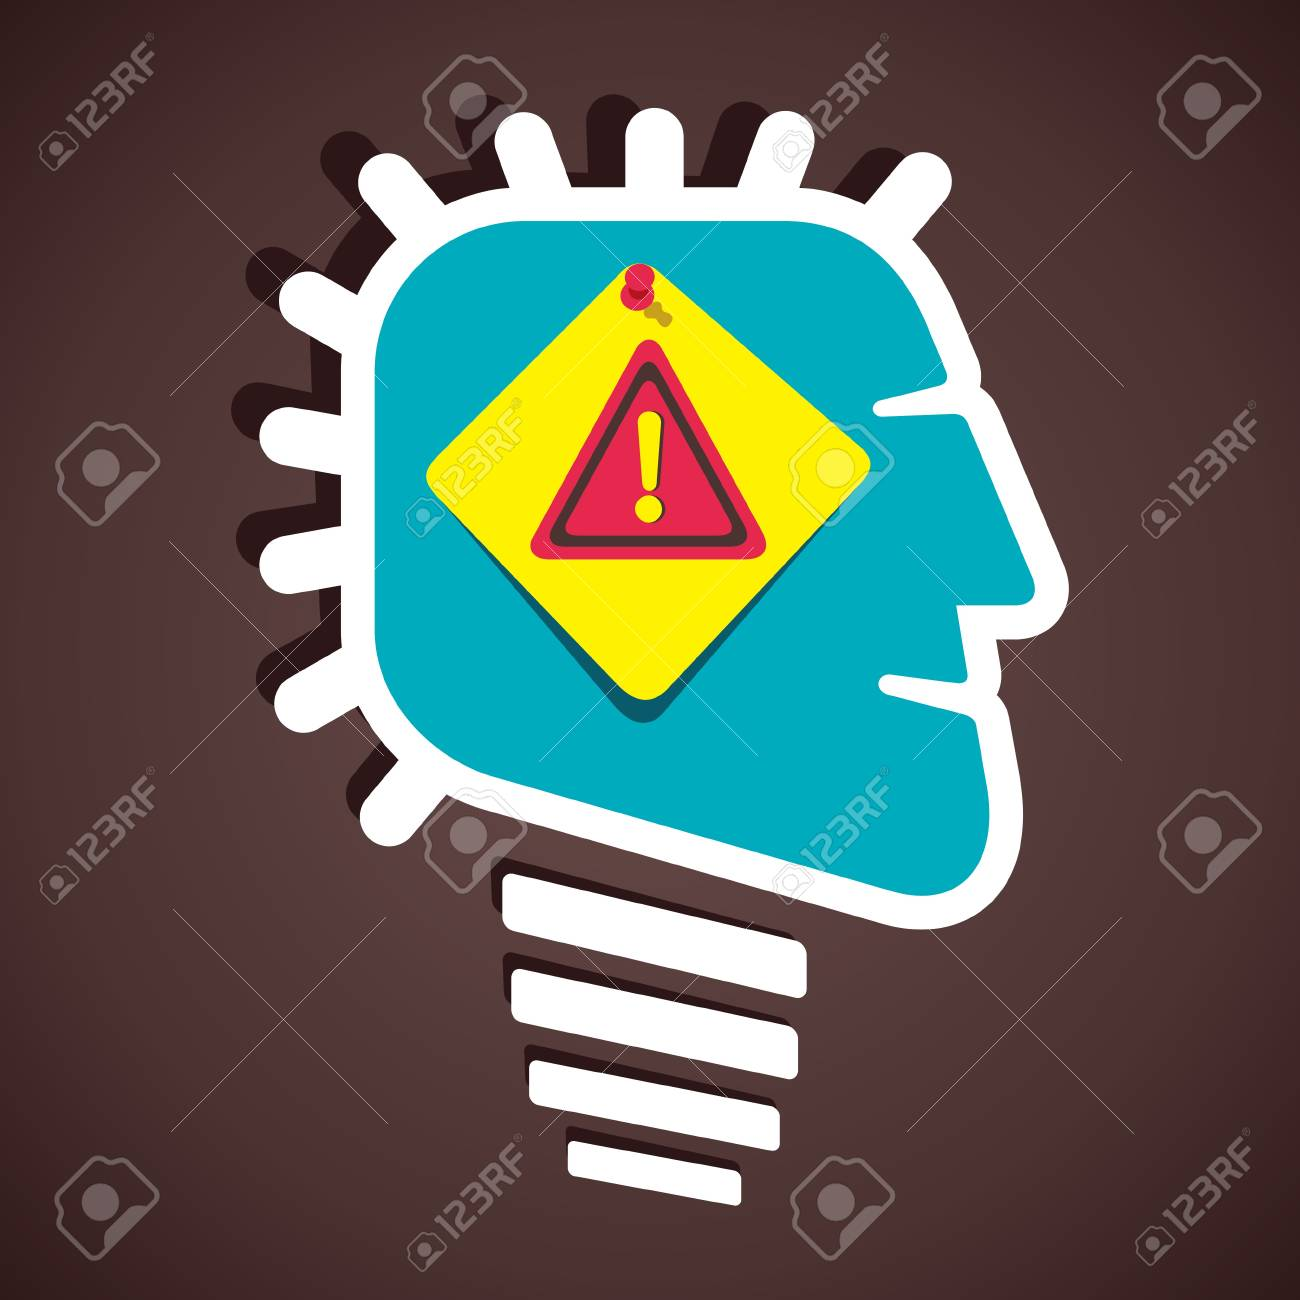 hazard attention sign in human head stock vector Stock Vector - 21330884